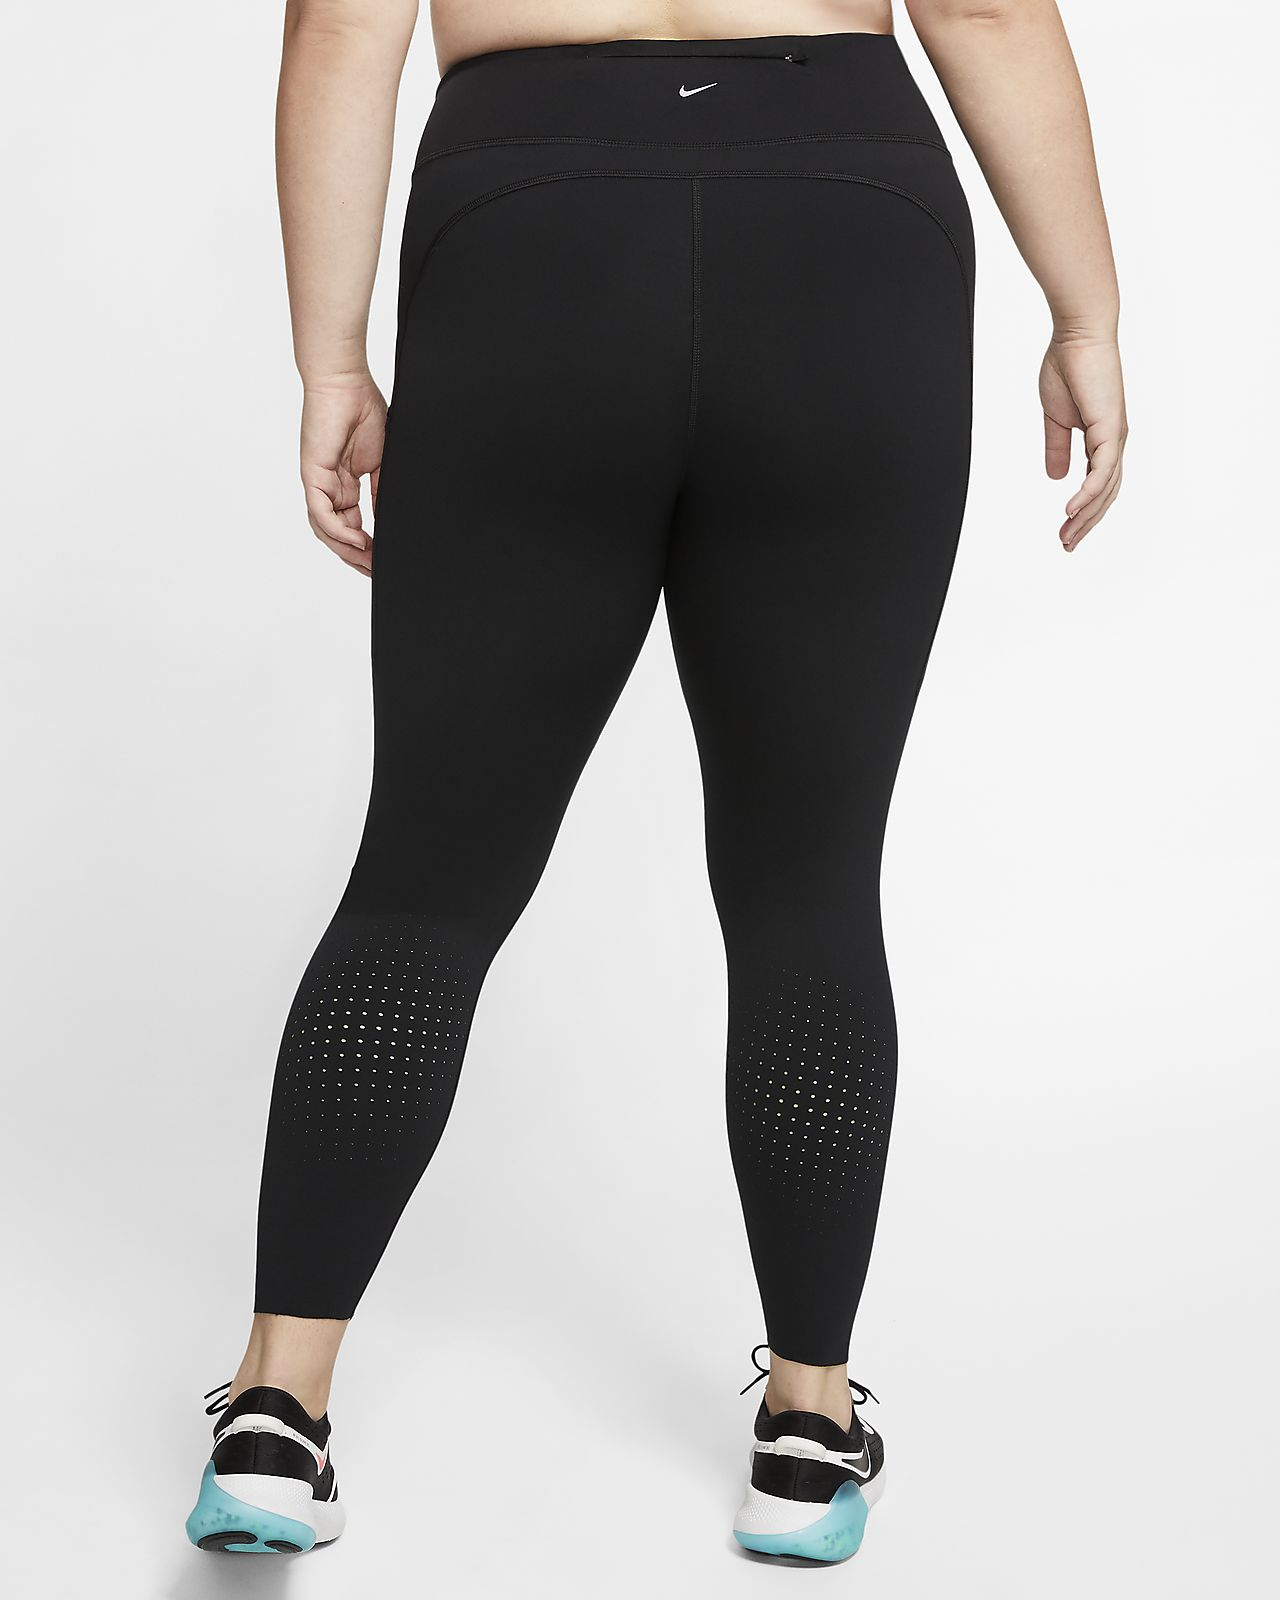 Nike Epic Luxe Hardlooptights voor dames